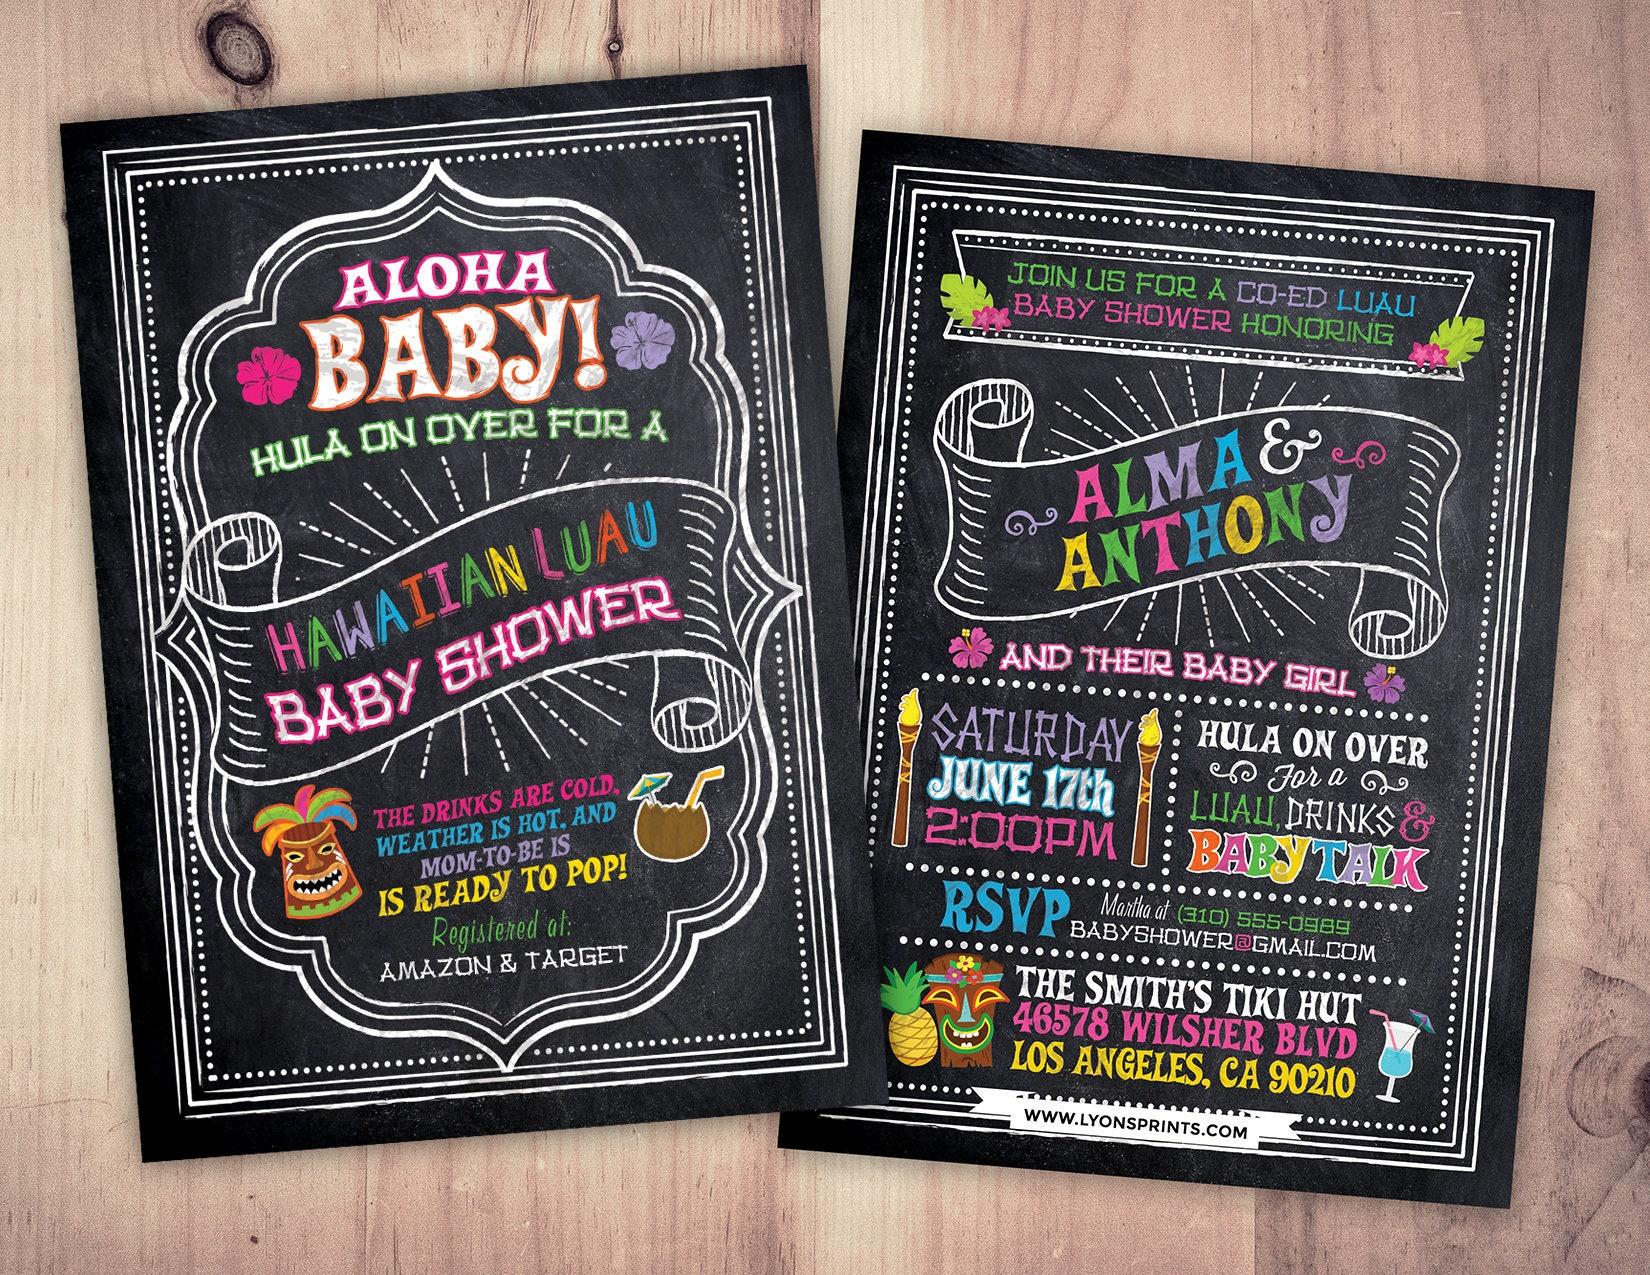 Aloha Baby Shower Invitation, Luau Baby Shower Invitation, Pineapple ...